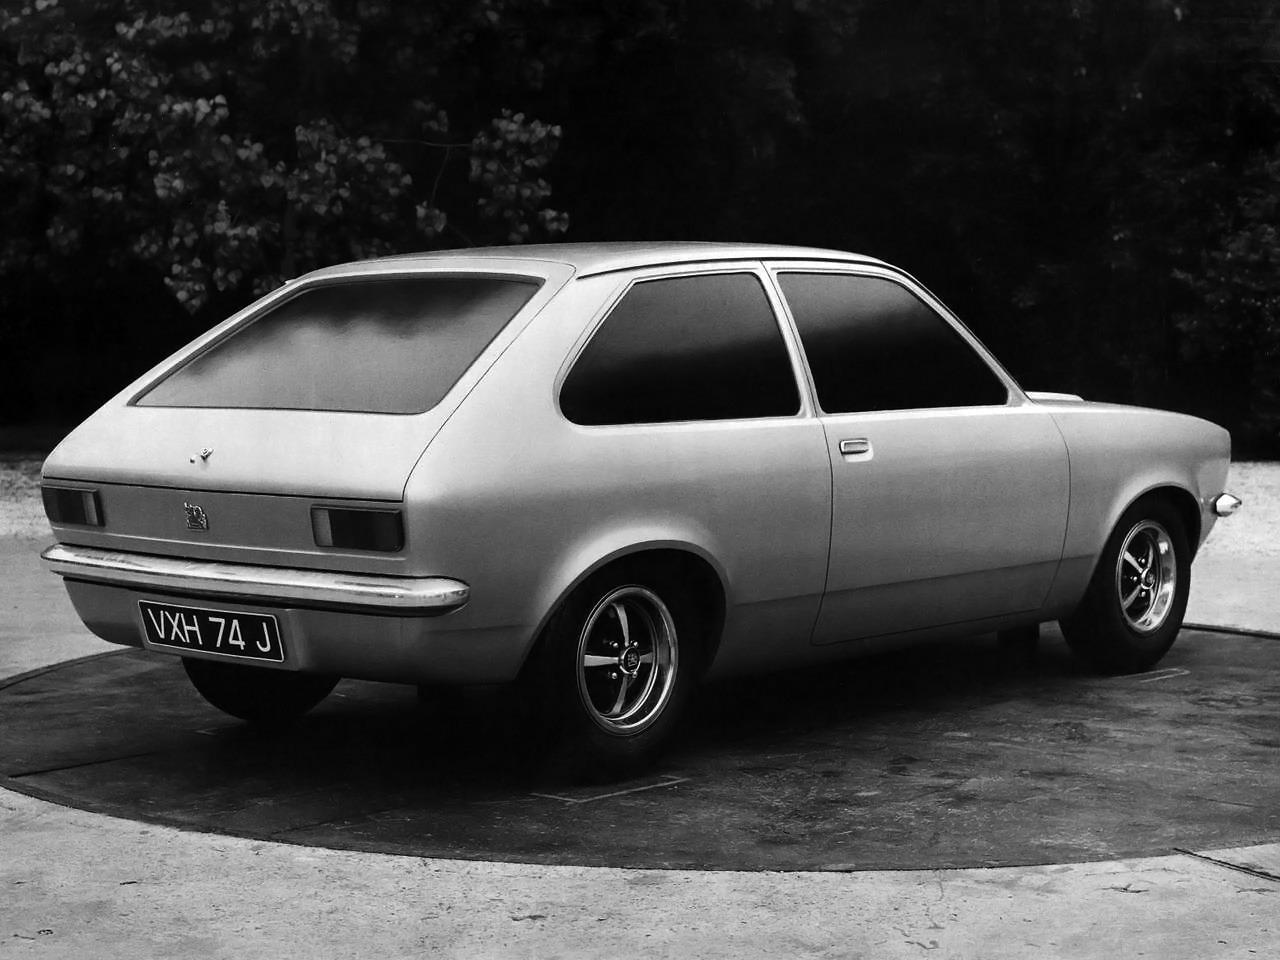 Vauxhall Chevette Hatchback (1973) – Old Concept Cars